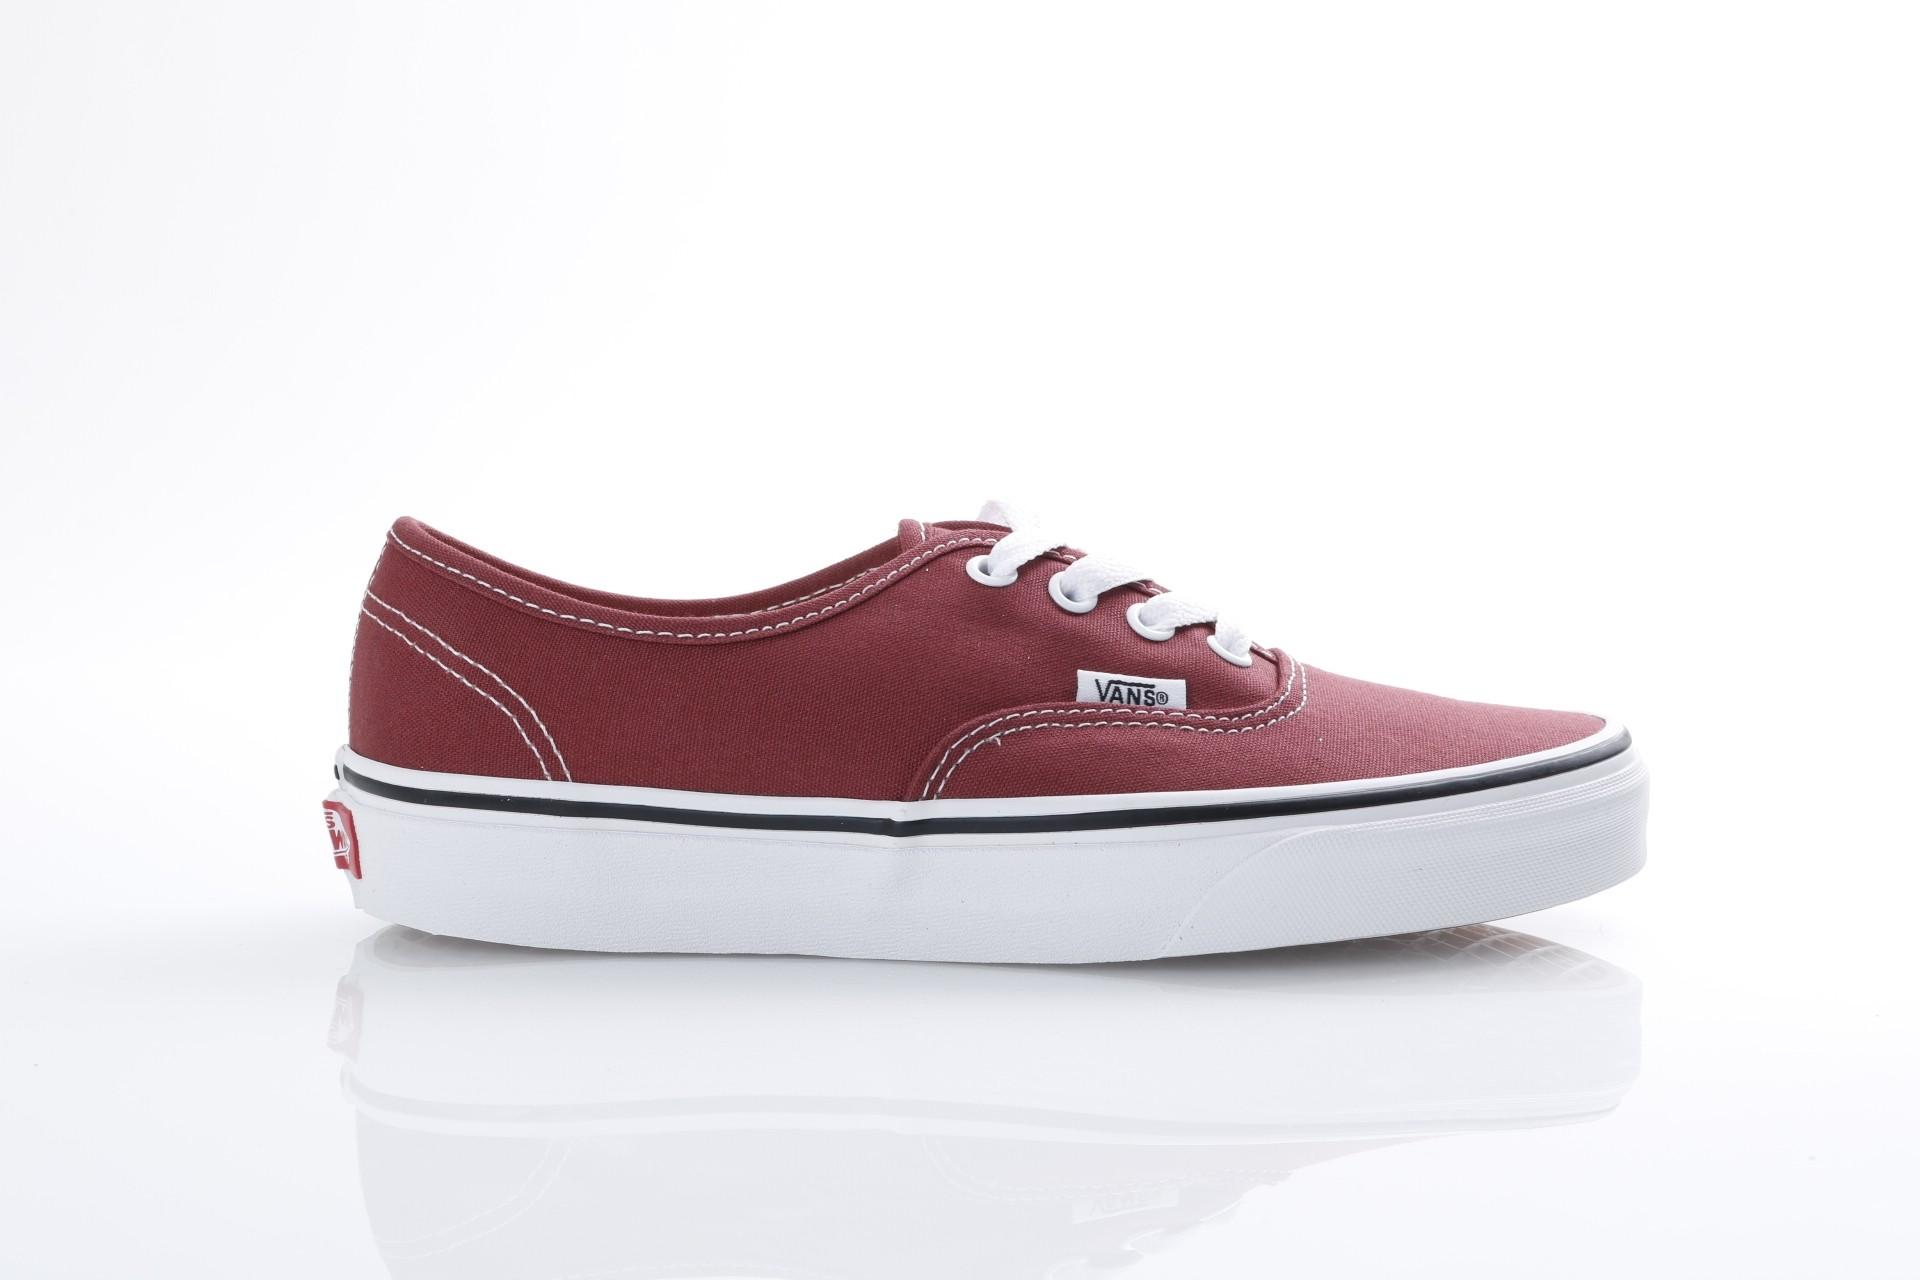 Afbeelding van Vans Classics VA38EM-Q9S Sneakers Authentic Rood